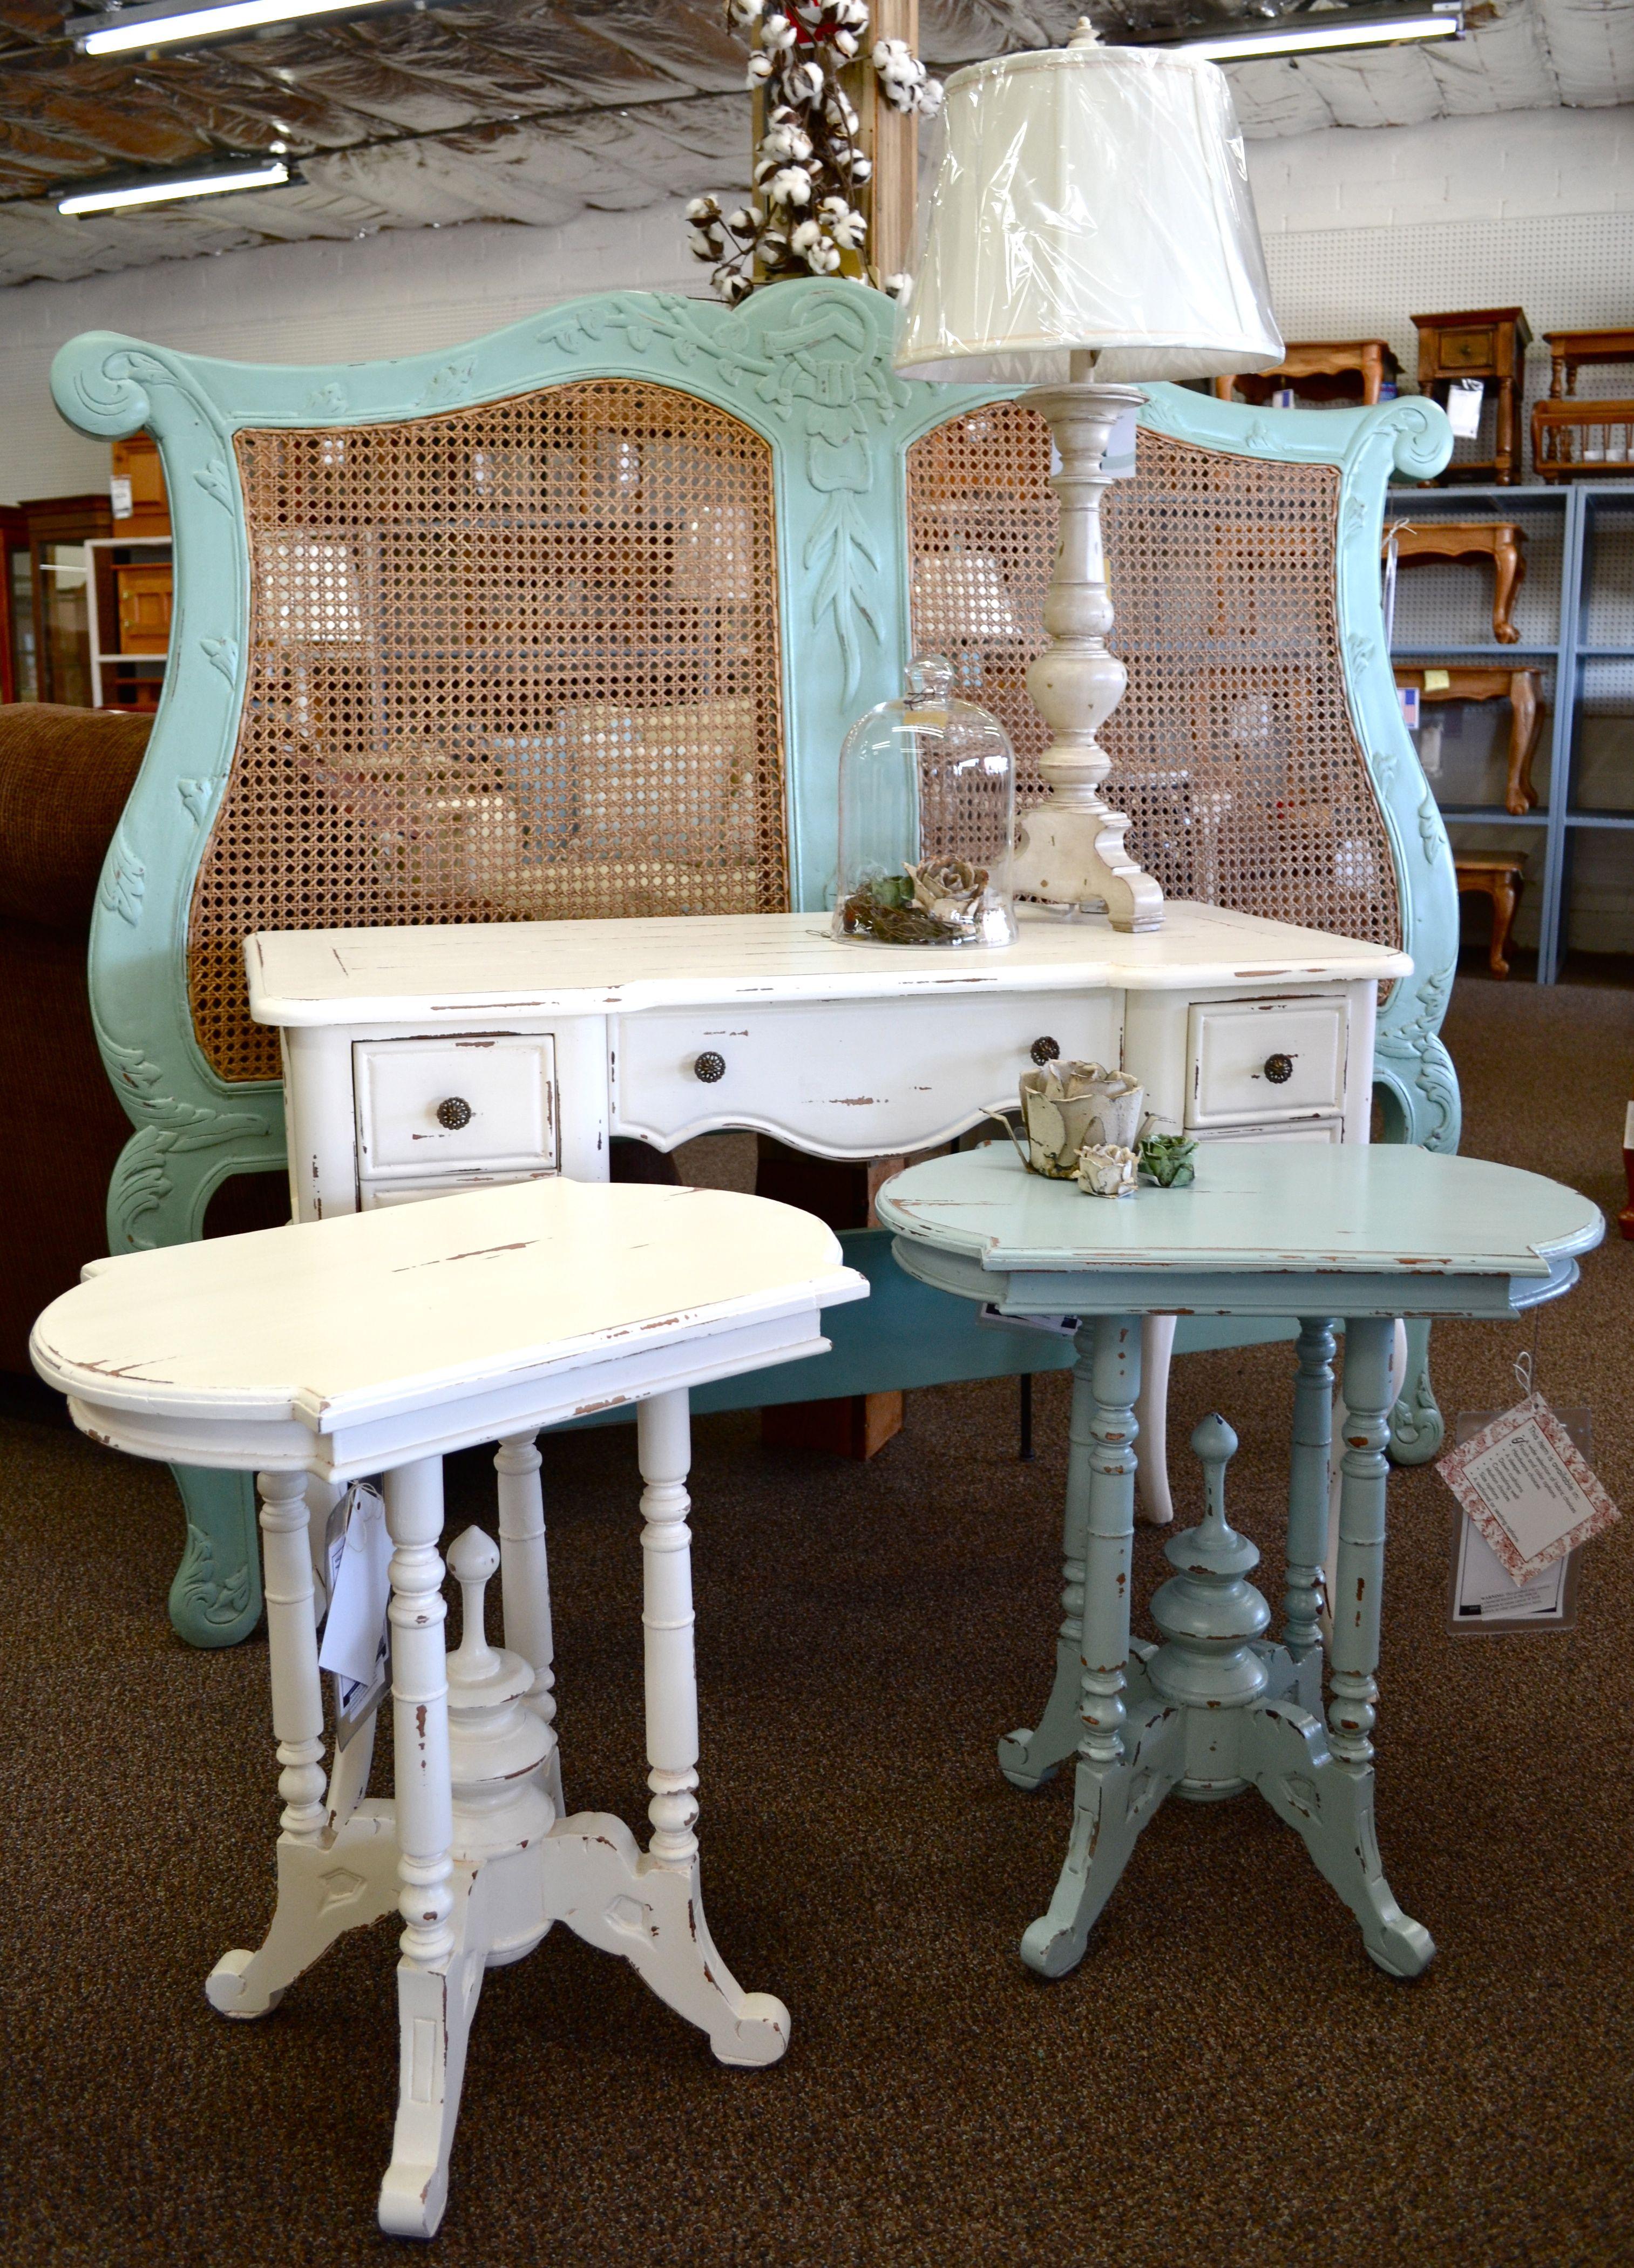 Distressed, Shabby Chic Bramble Furniture At Tuckeru0027s Valley Furniture In El  Cajon, ...